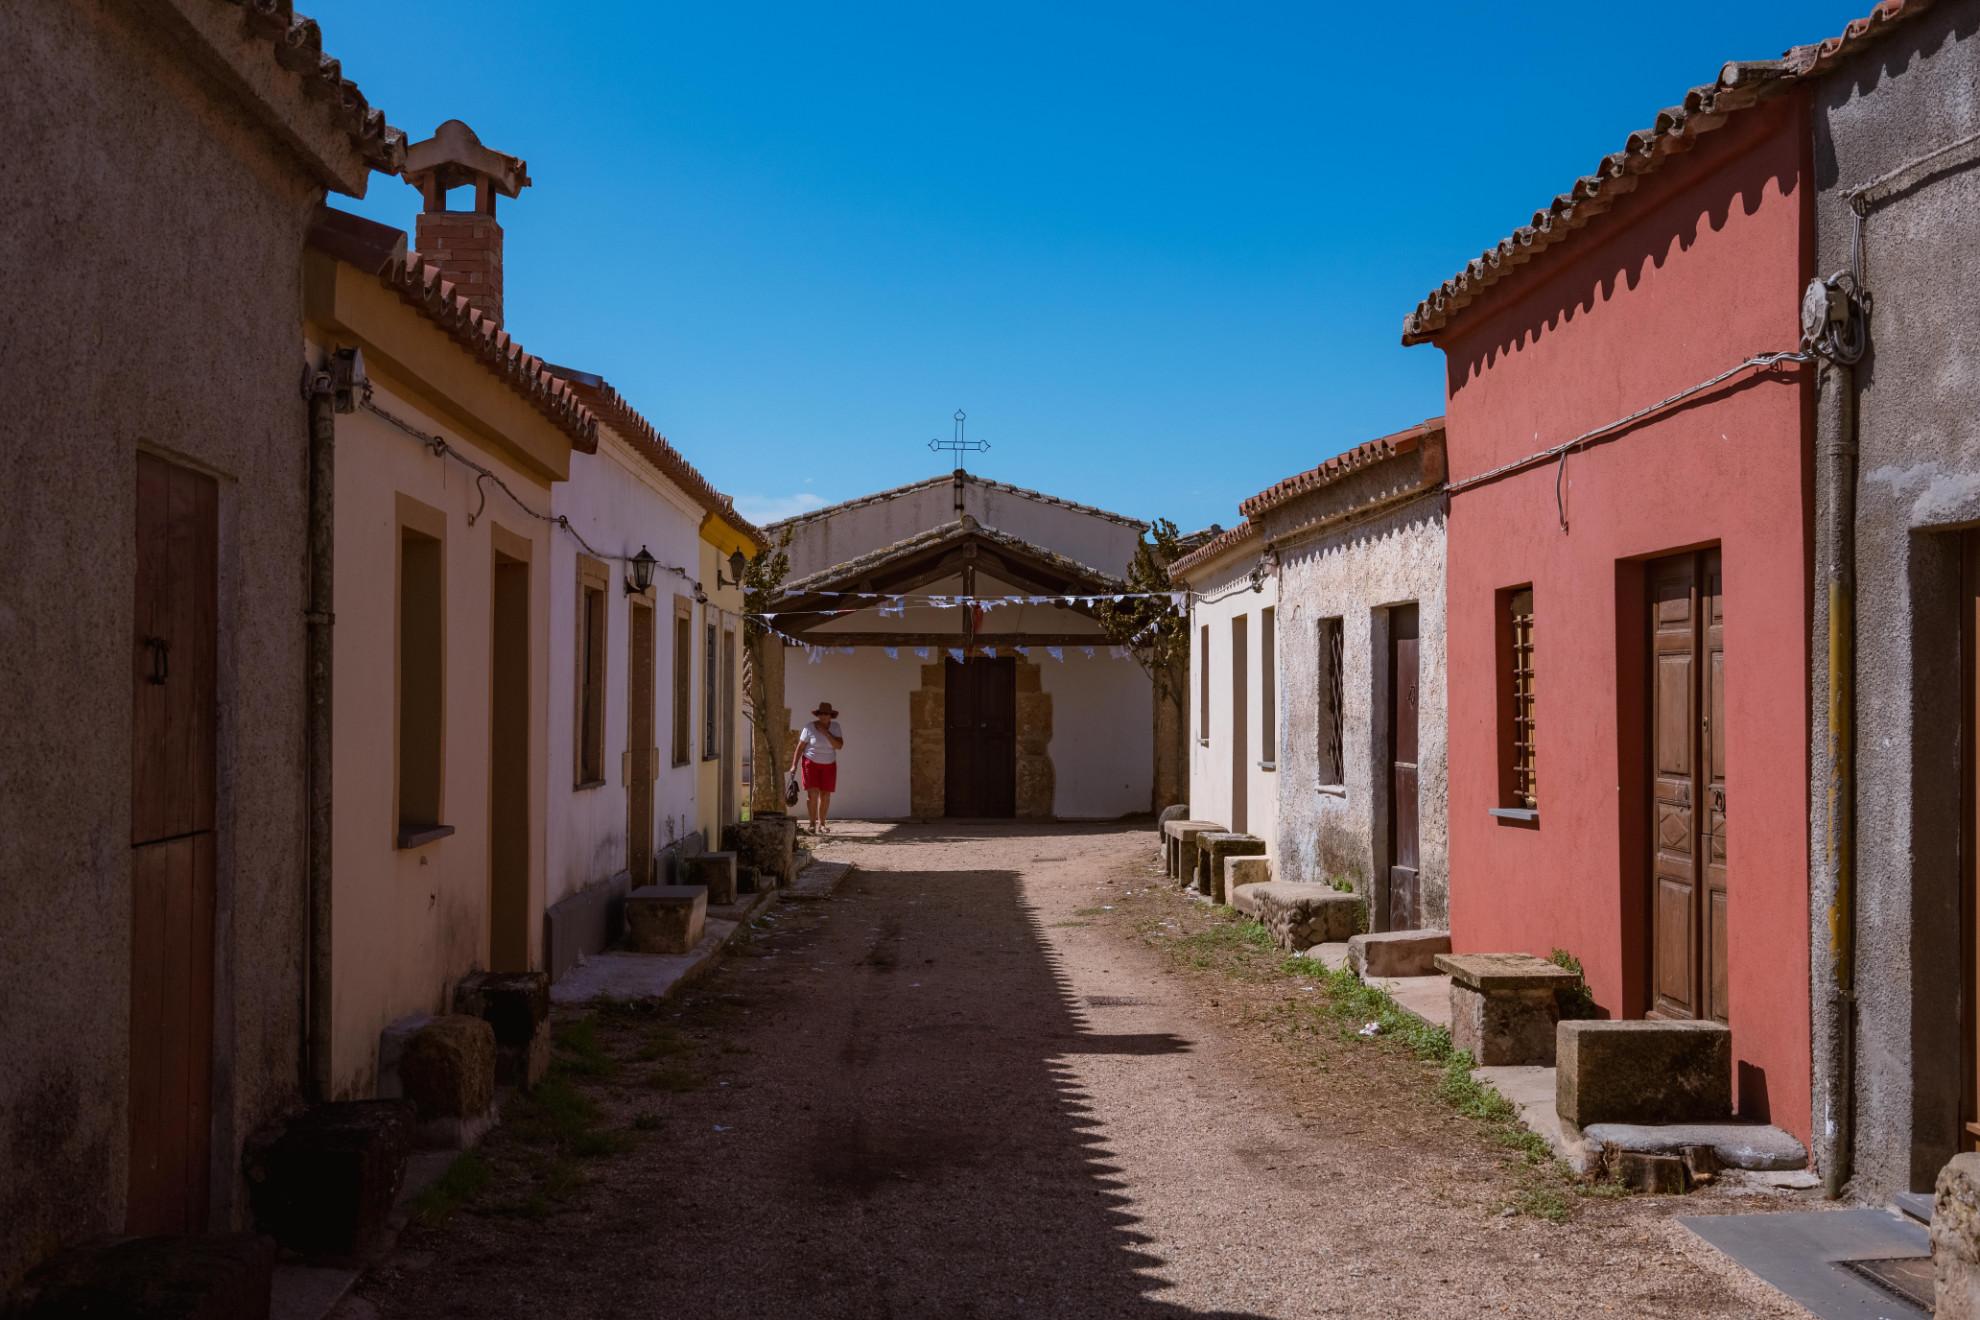 La chiesetta di San Salvatore di Sinis | Ph. Valentina Sinis - Trentaremi